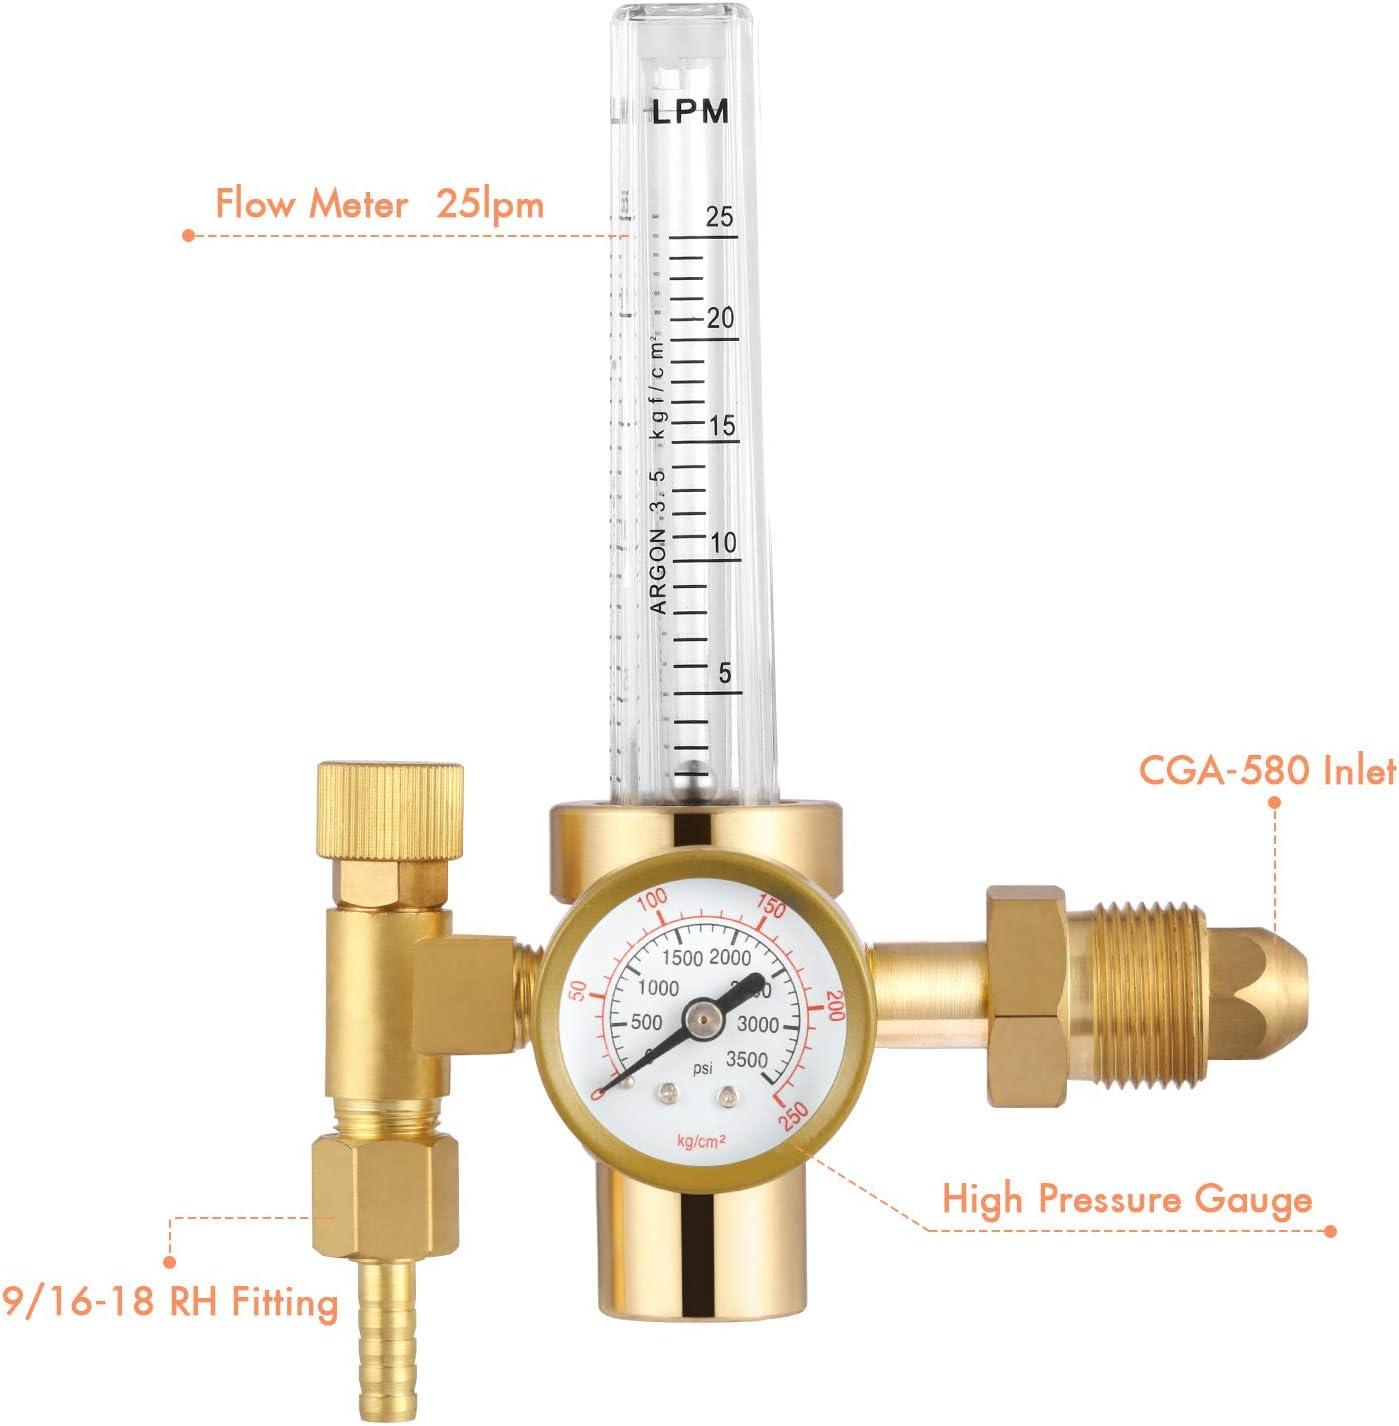 Argon Gas Regulator Flowmeter 0-25lpm CGA-580 for TIG Welder Machine Full Copper Gas Values Welding Accessory for Tig Welding machine